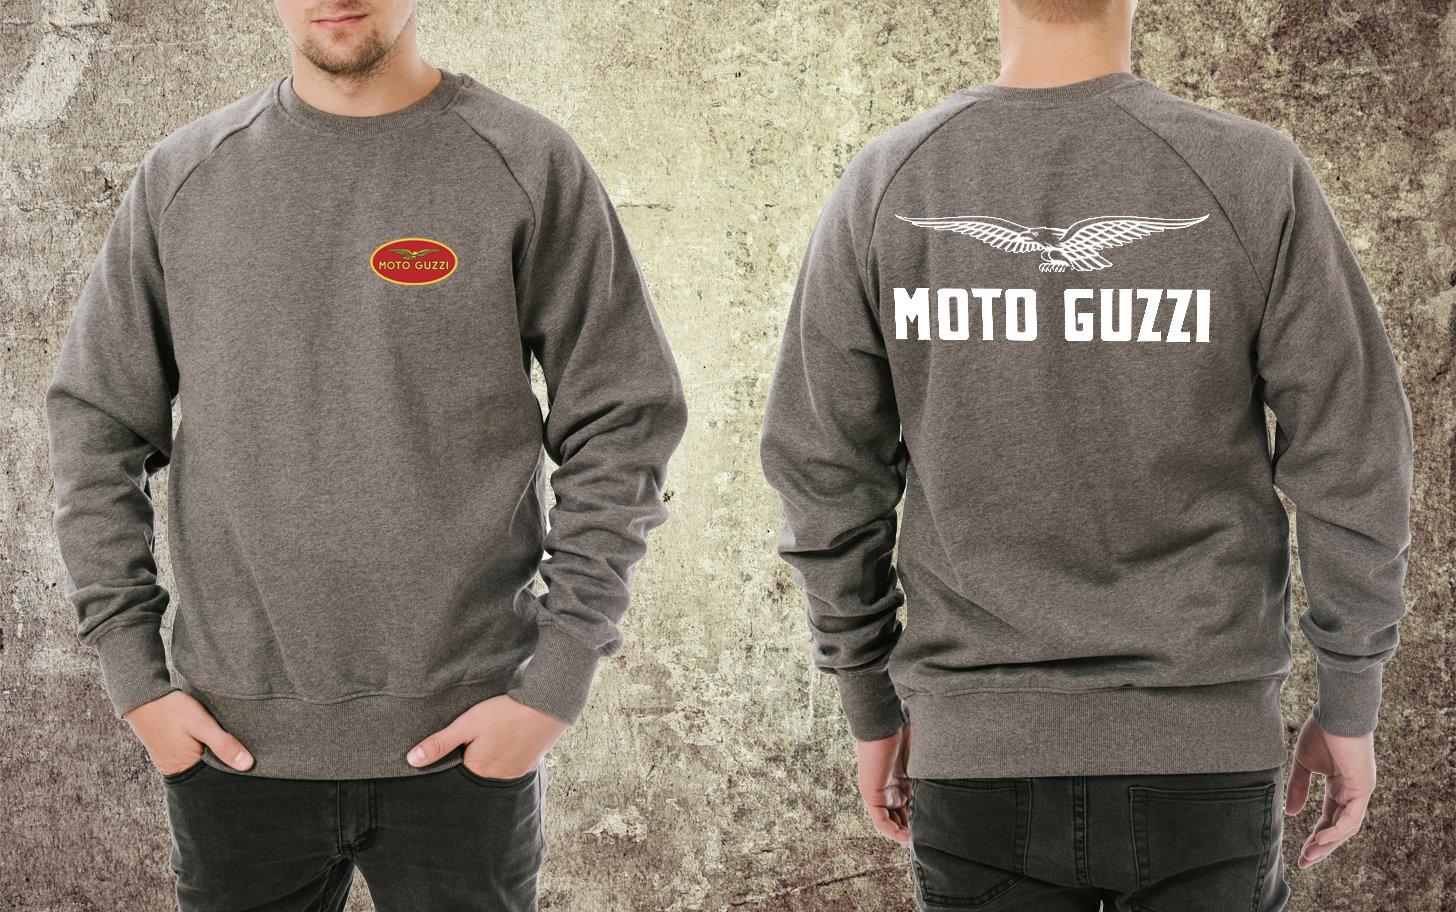 Felpa Moto Guzzi manica lunga girocollo Taglia M Adesiviautoemoto